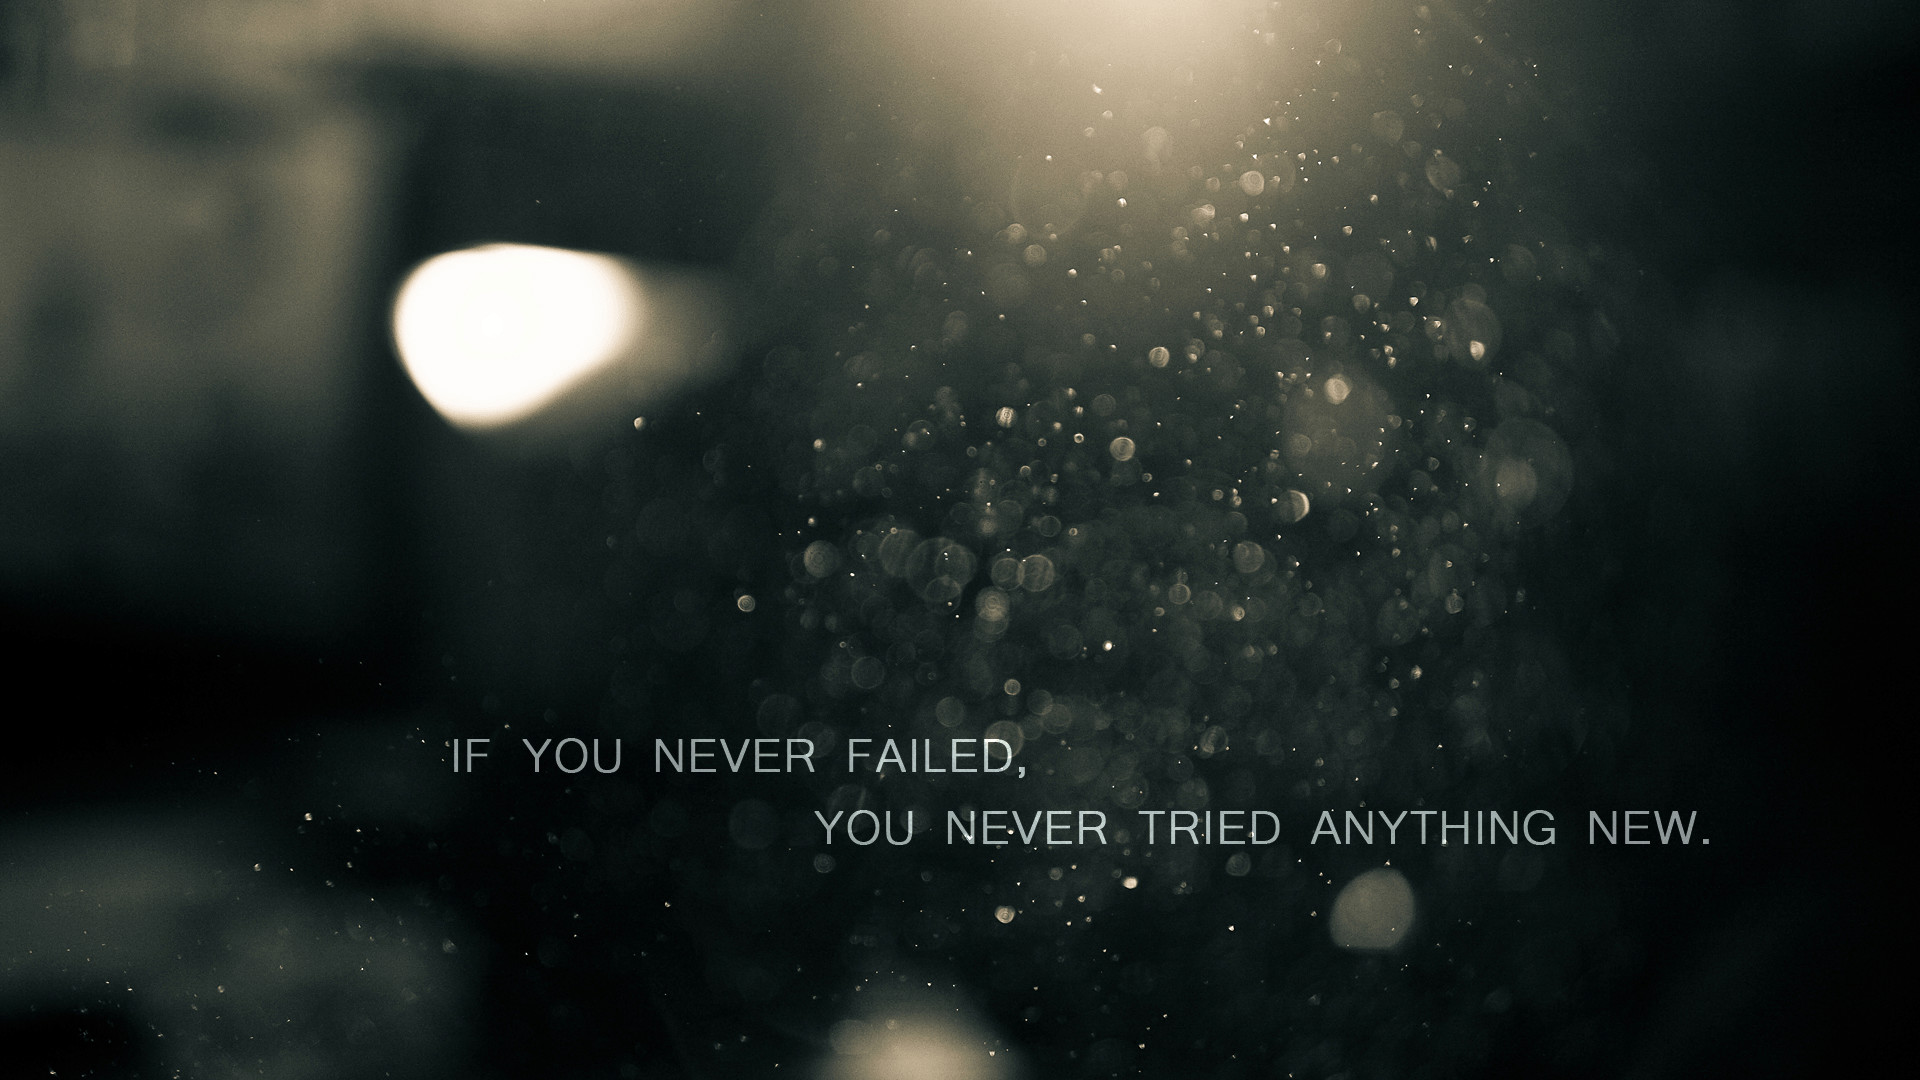 Motivational Quote Wallpaper 10